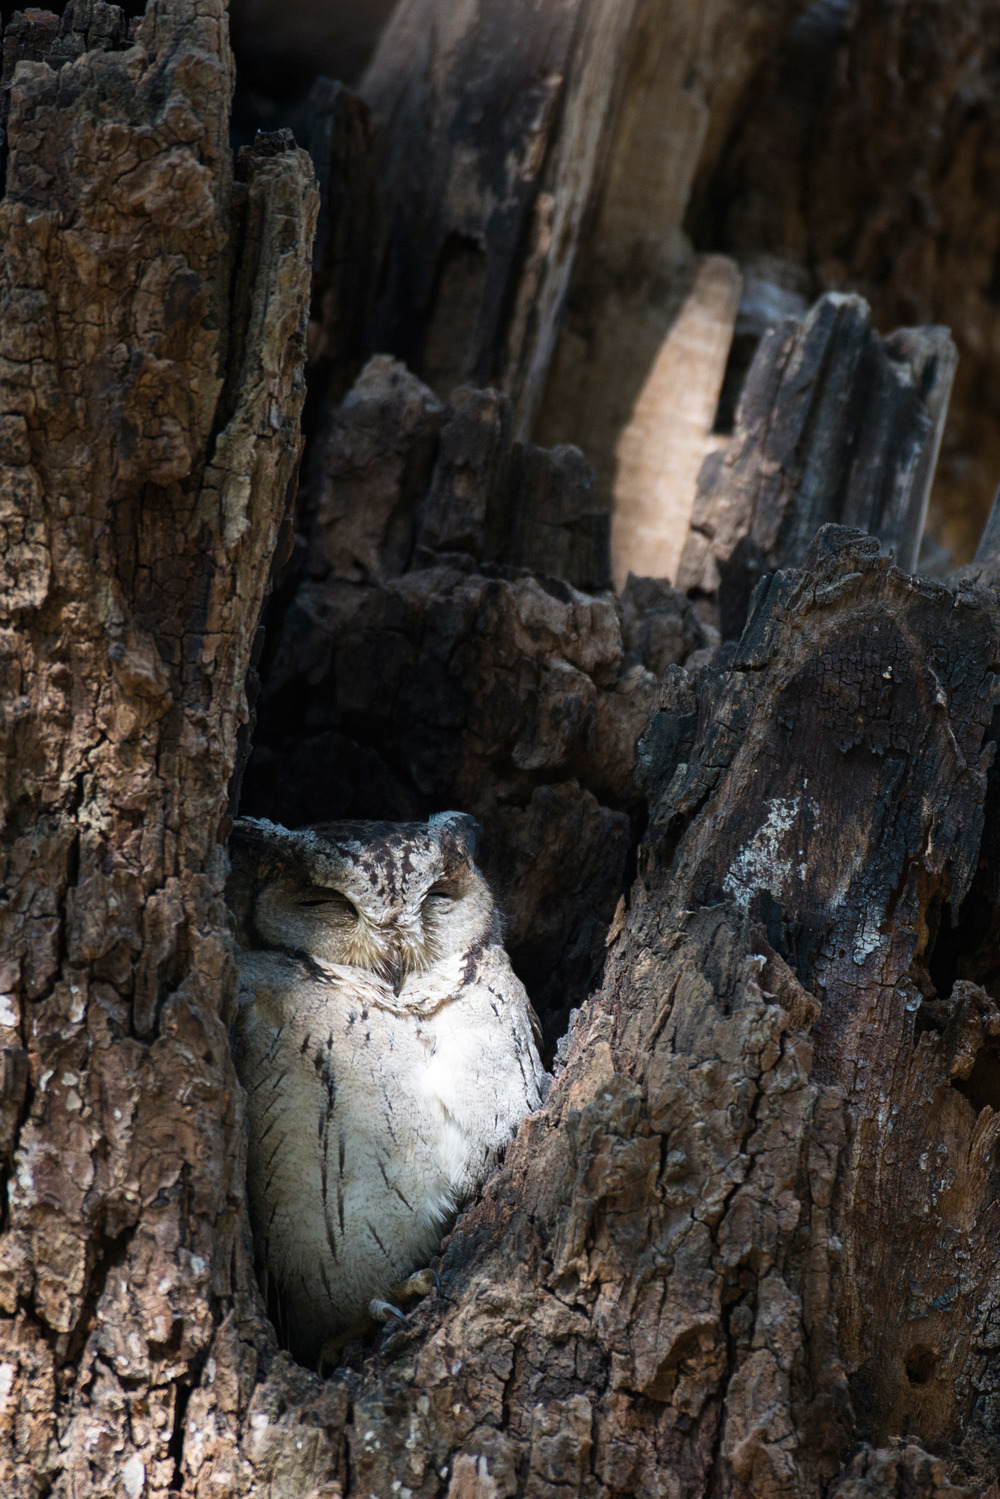 Indian scops owl sleeping in tree hollow, Ranthambhore National Park, Rajasthan, India